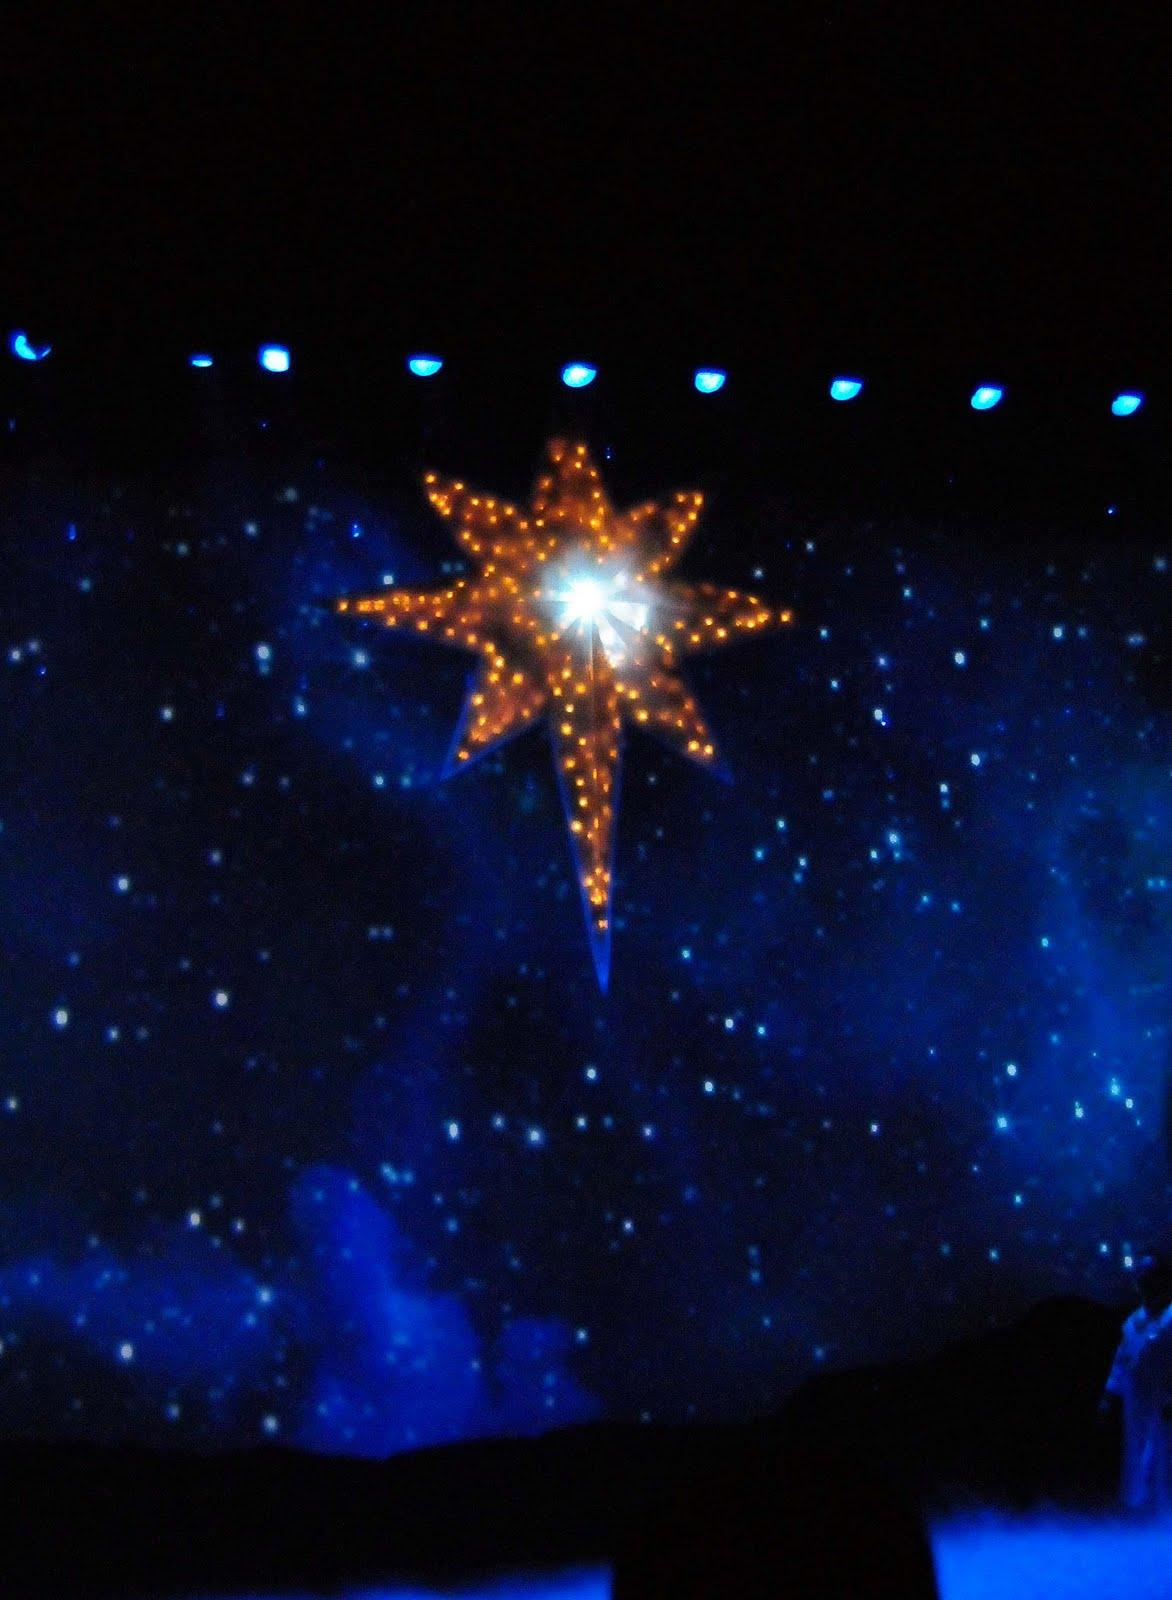 NewsPlusNotes: Scott & Carol Present Christmas at Sea World Orlando